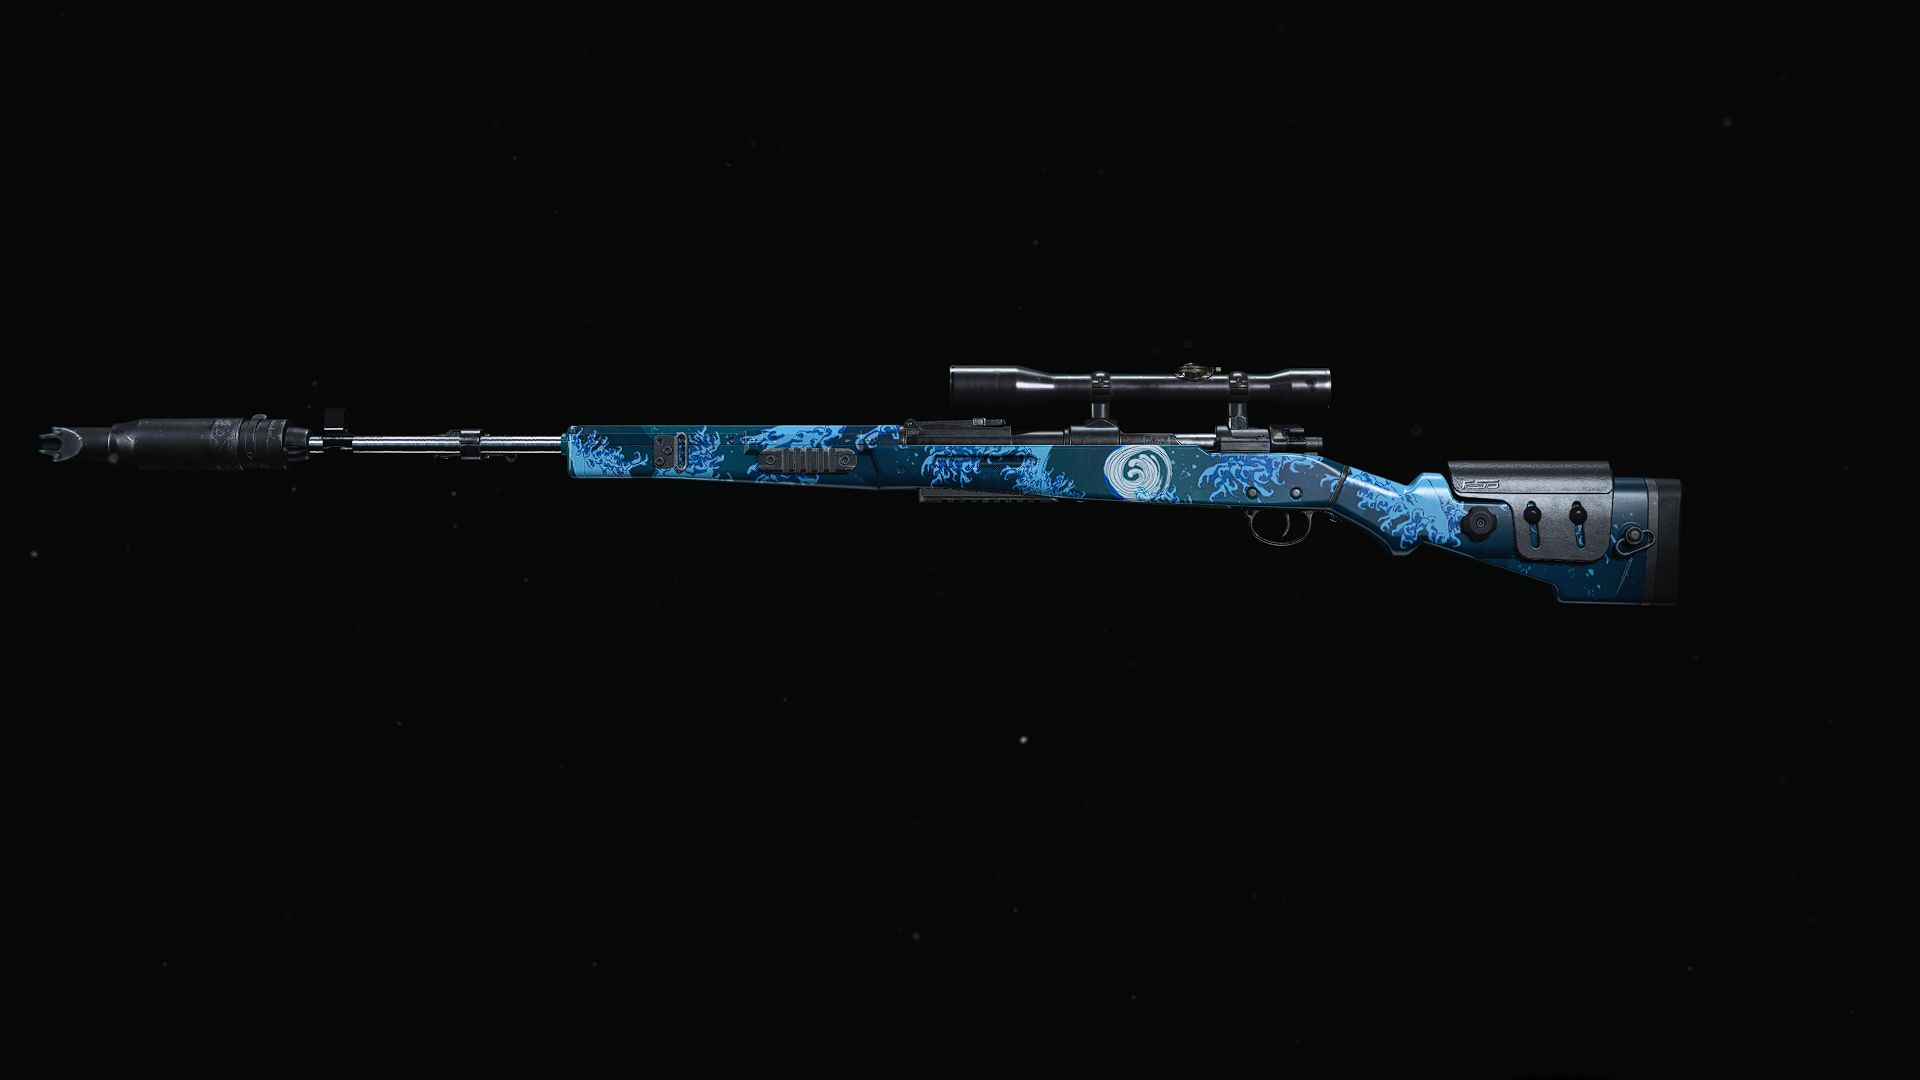 Kar98k Marksman rifle